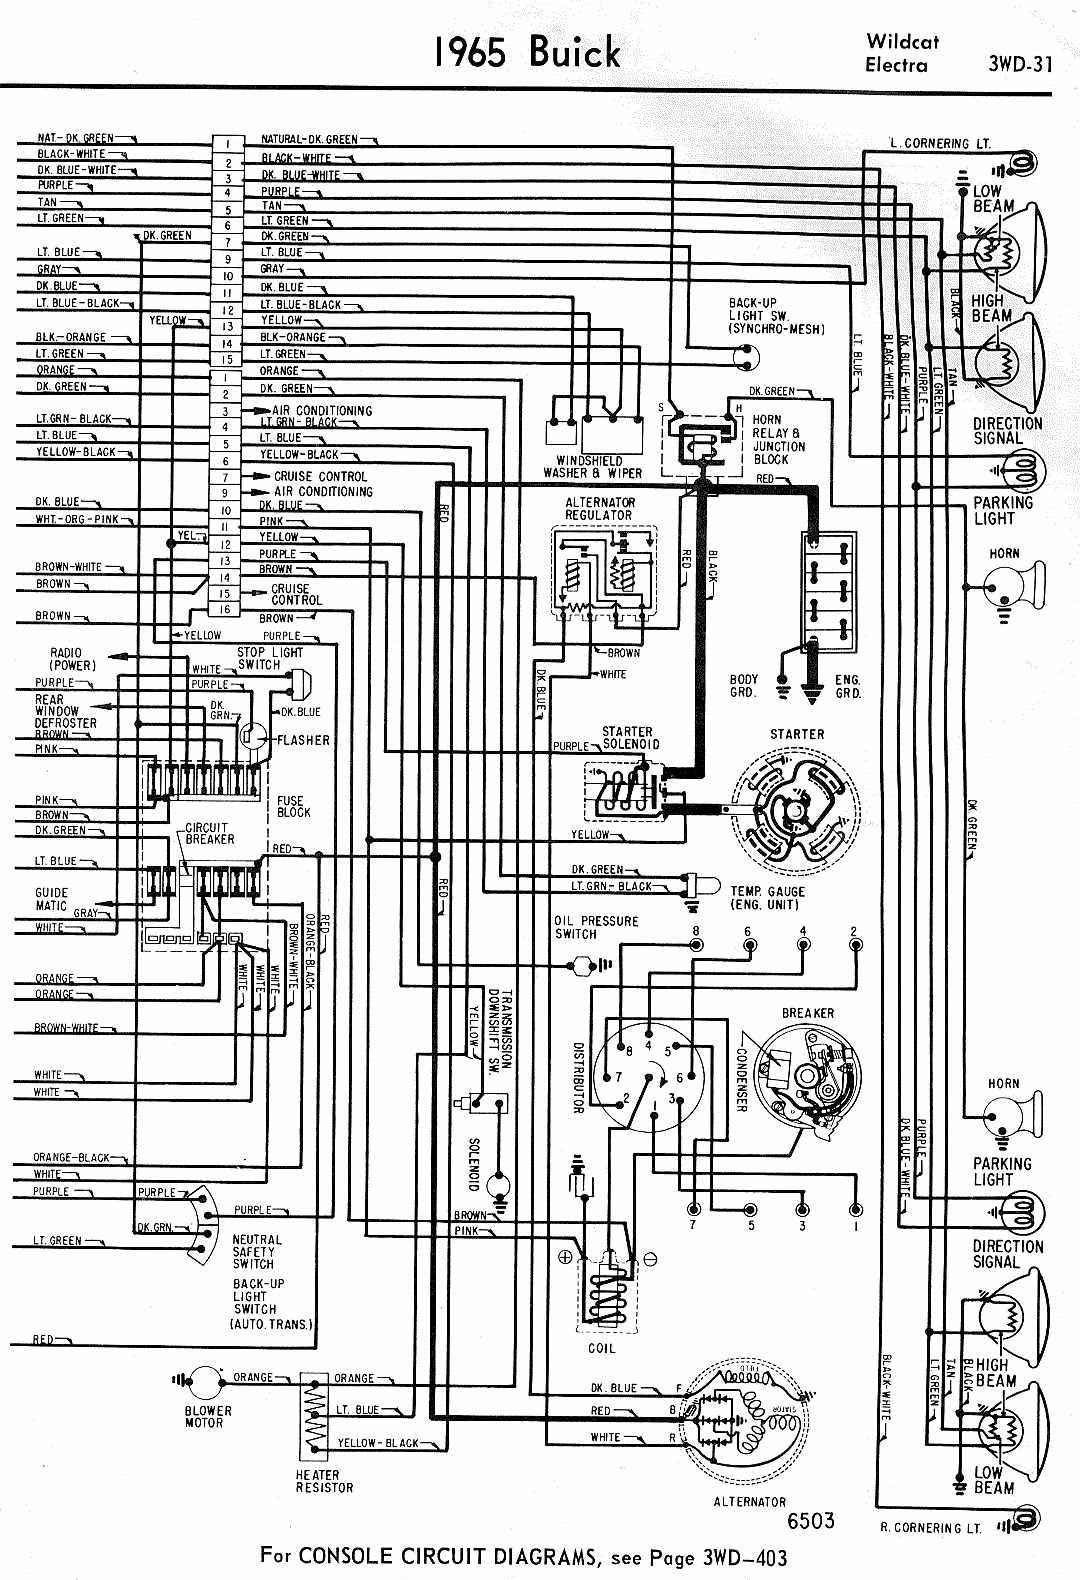 1972 Buick Wiring Diagrams Automotive - Wiring Diagram Book slim-mode -  slim-mode.prolocoisoletremiti.it [ 1580 x 1080 Pixel ]